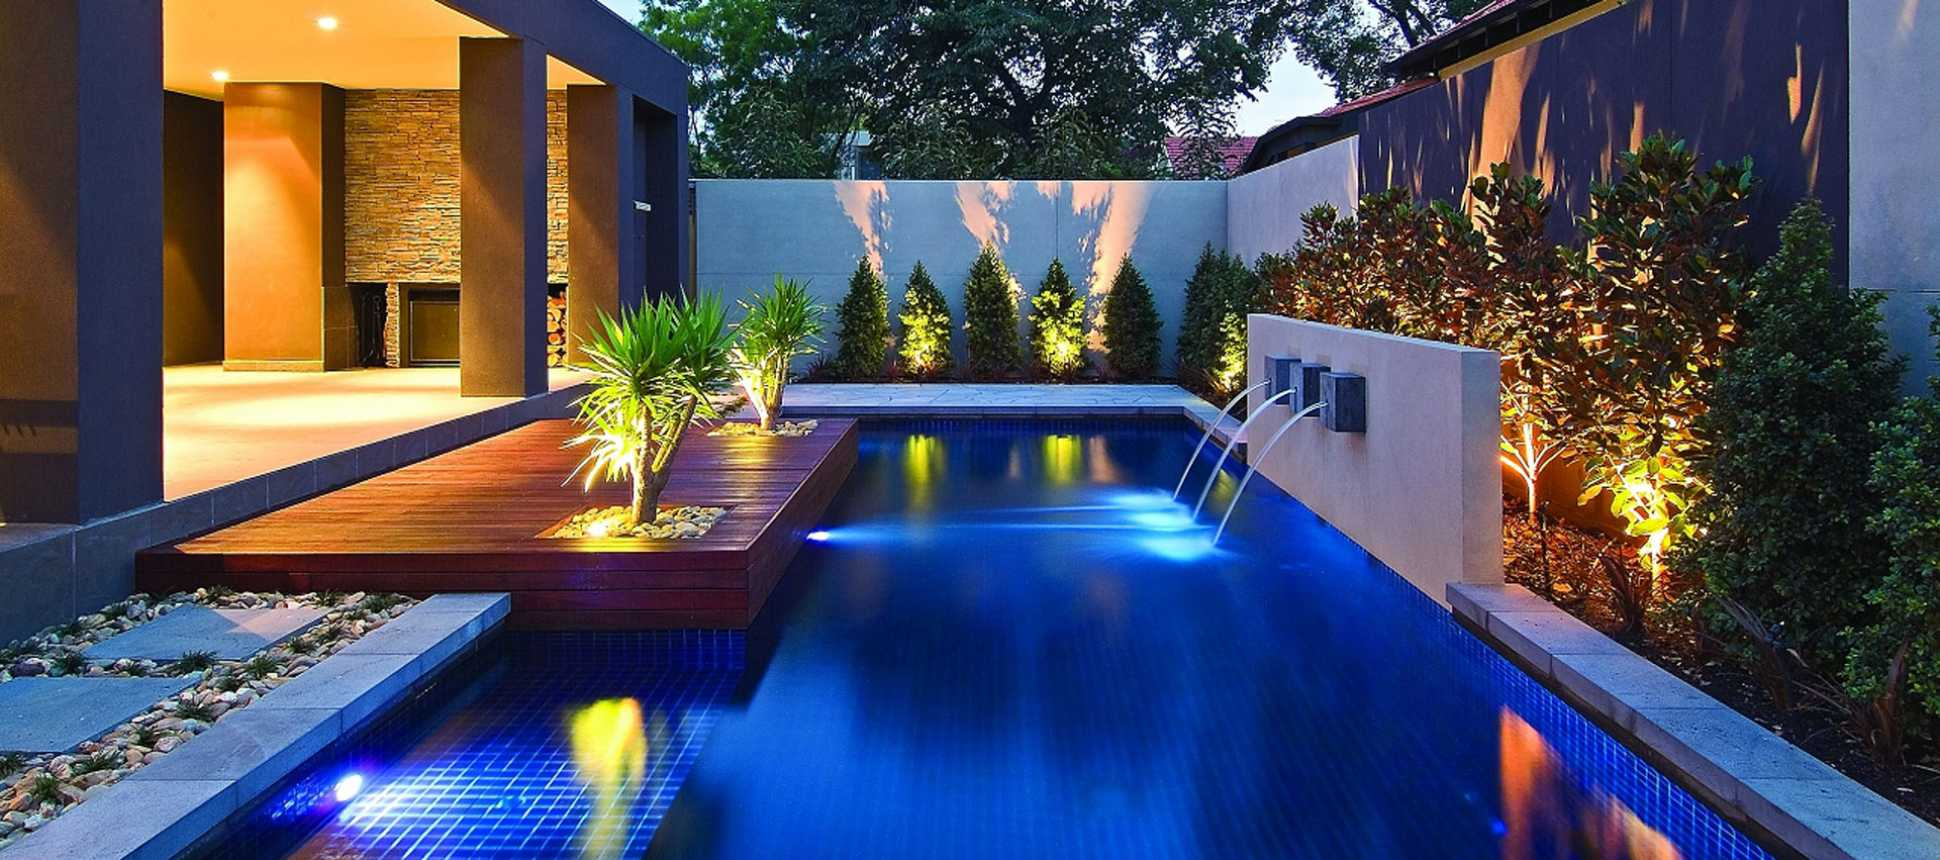 haus wellness ac schwimmbadtechnik. Black Bedroom Furniture Sets. Home Design Ideas